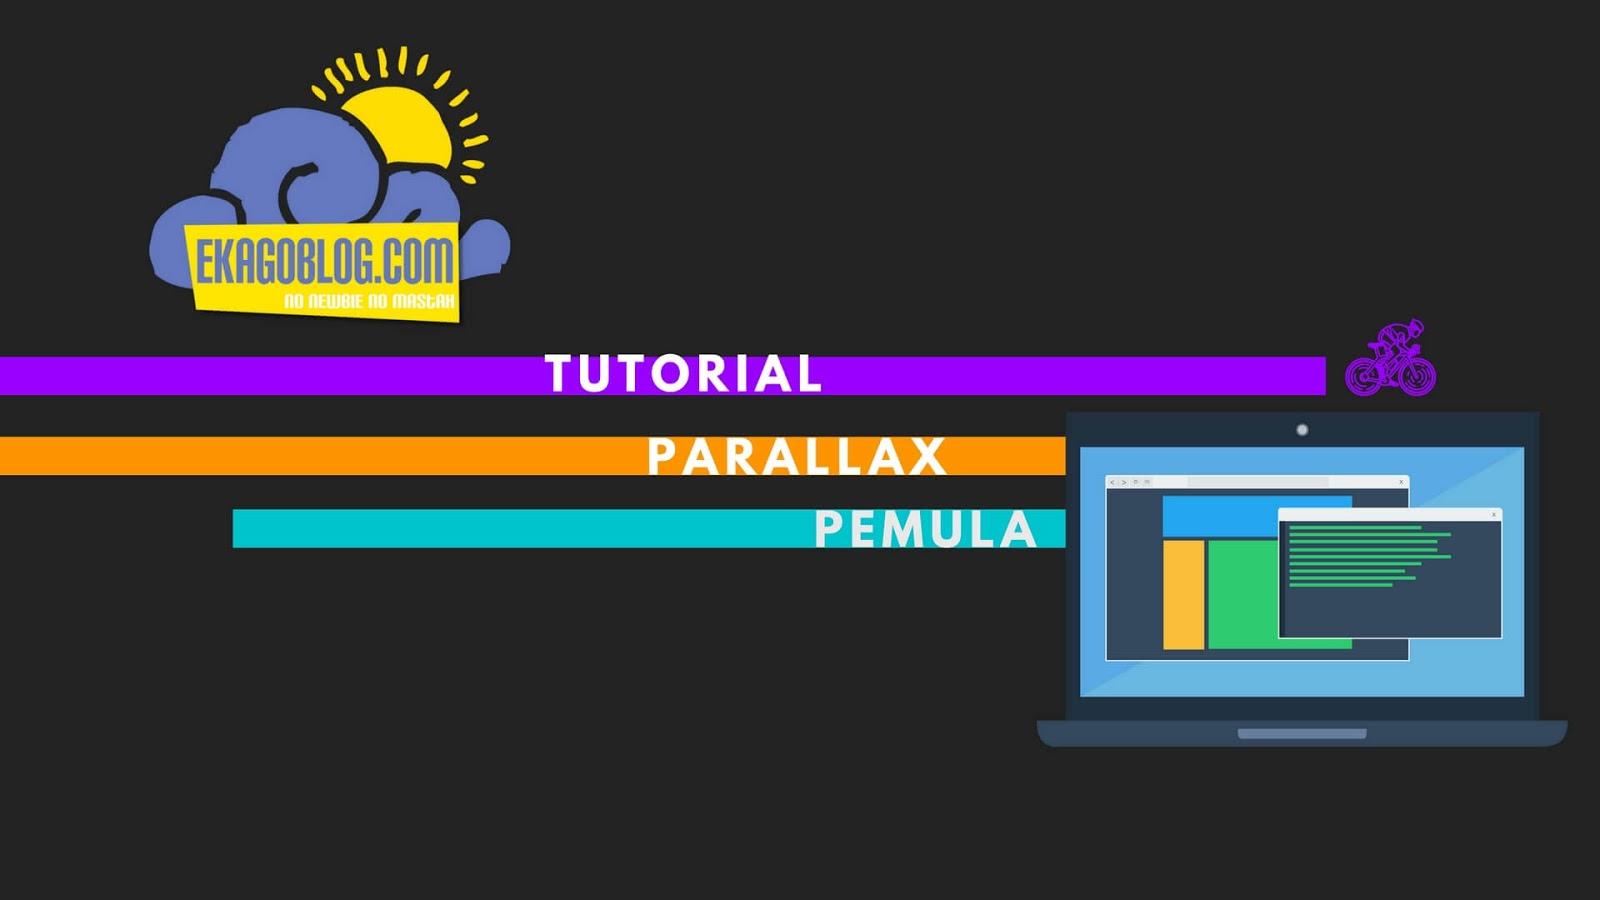 Tutorial Parallax Pemula